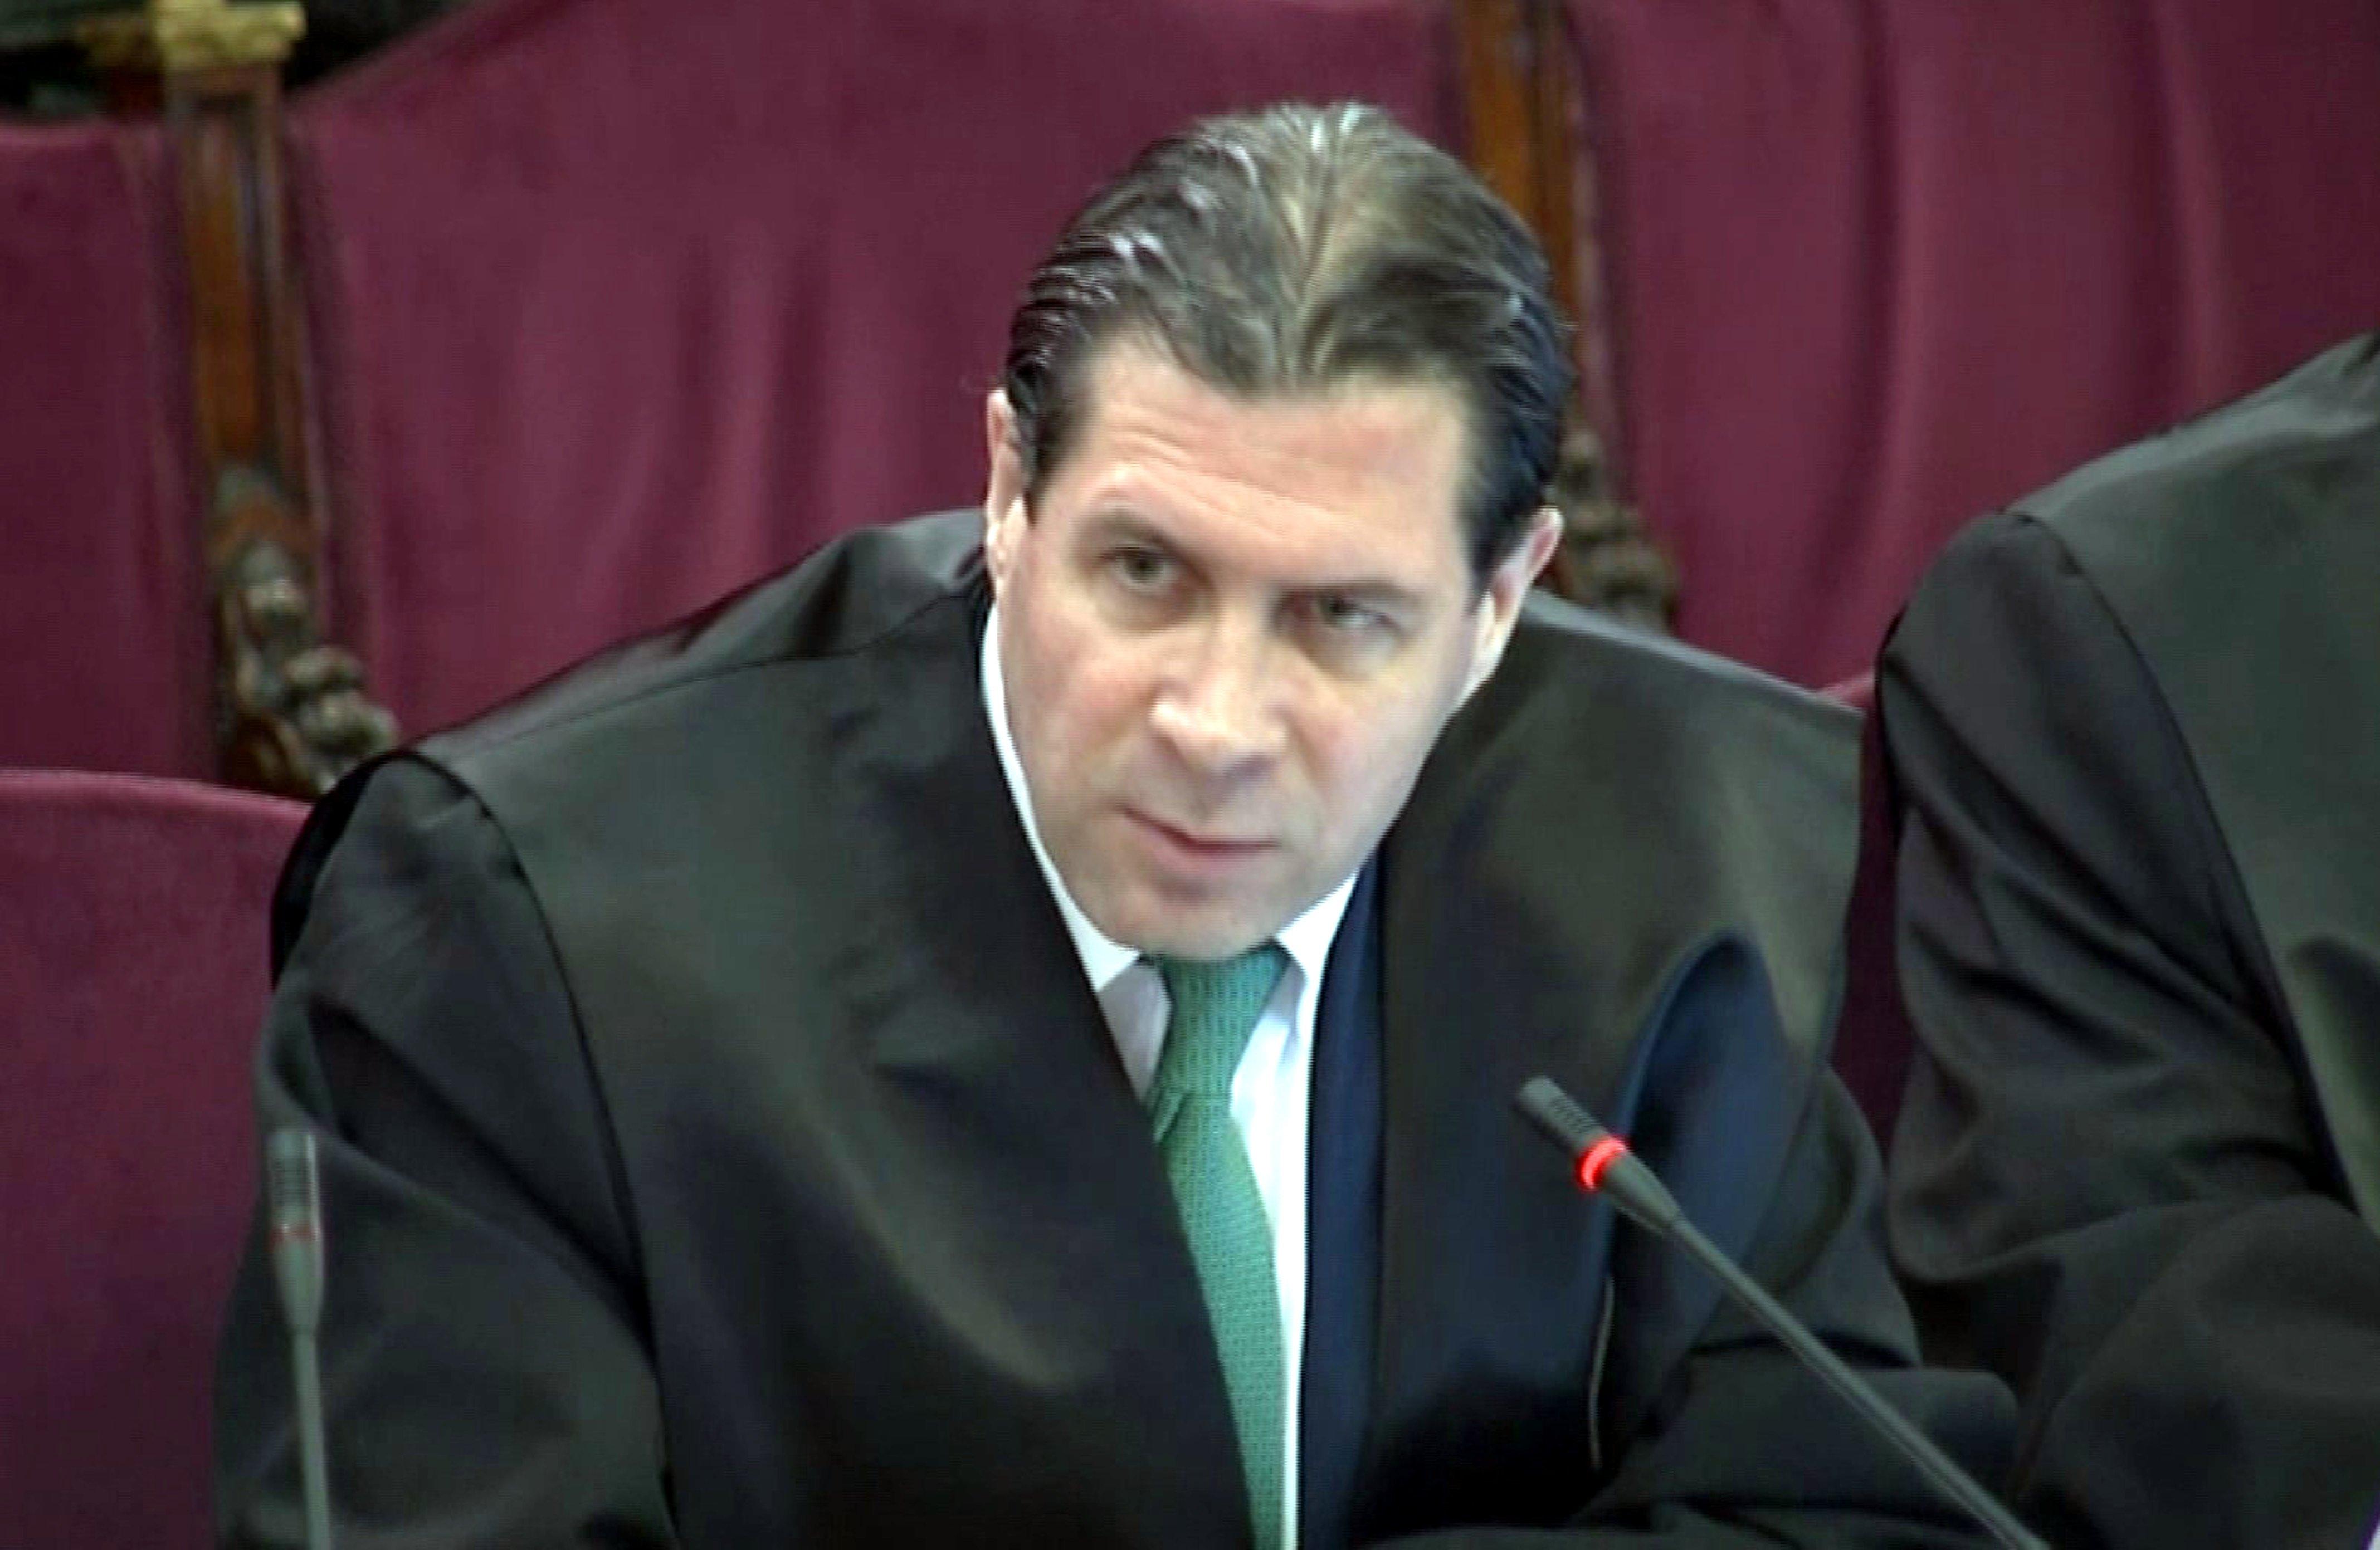 judici procés advocat Vox Pedro Fernández ACN